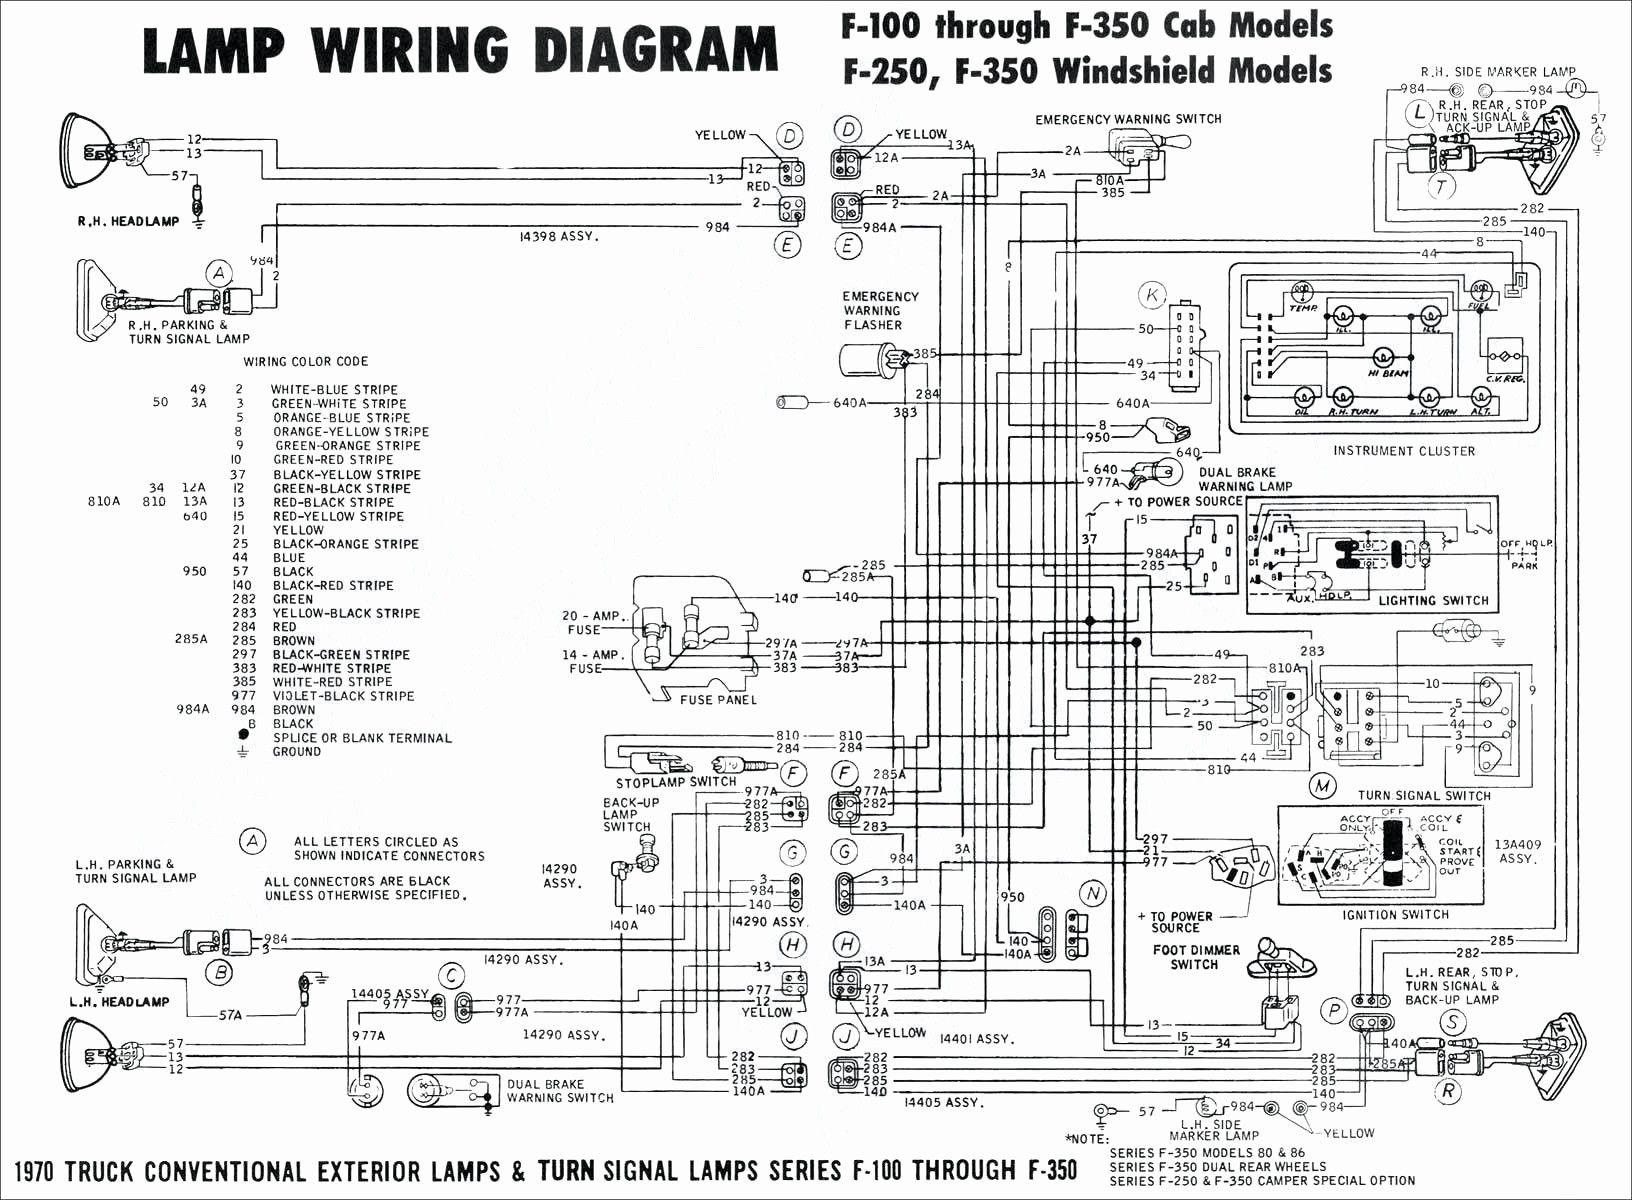 1995 Kawasaki Zxr Tail Light Wiring Unique In 2020 Trailer Wiring Diagram Electrical Wiring Diagram Diagram